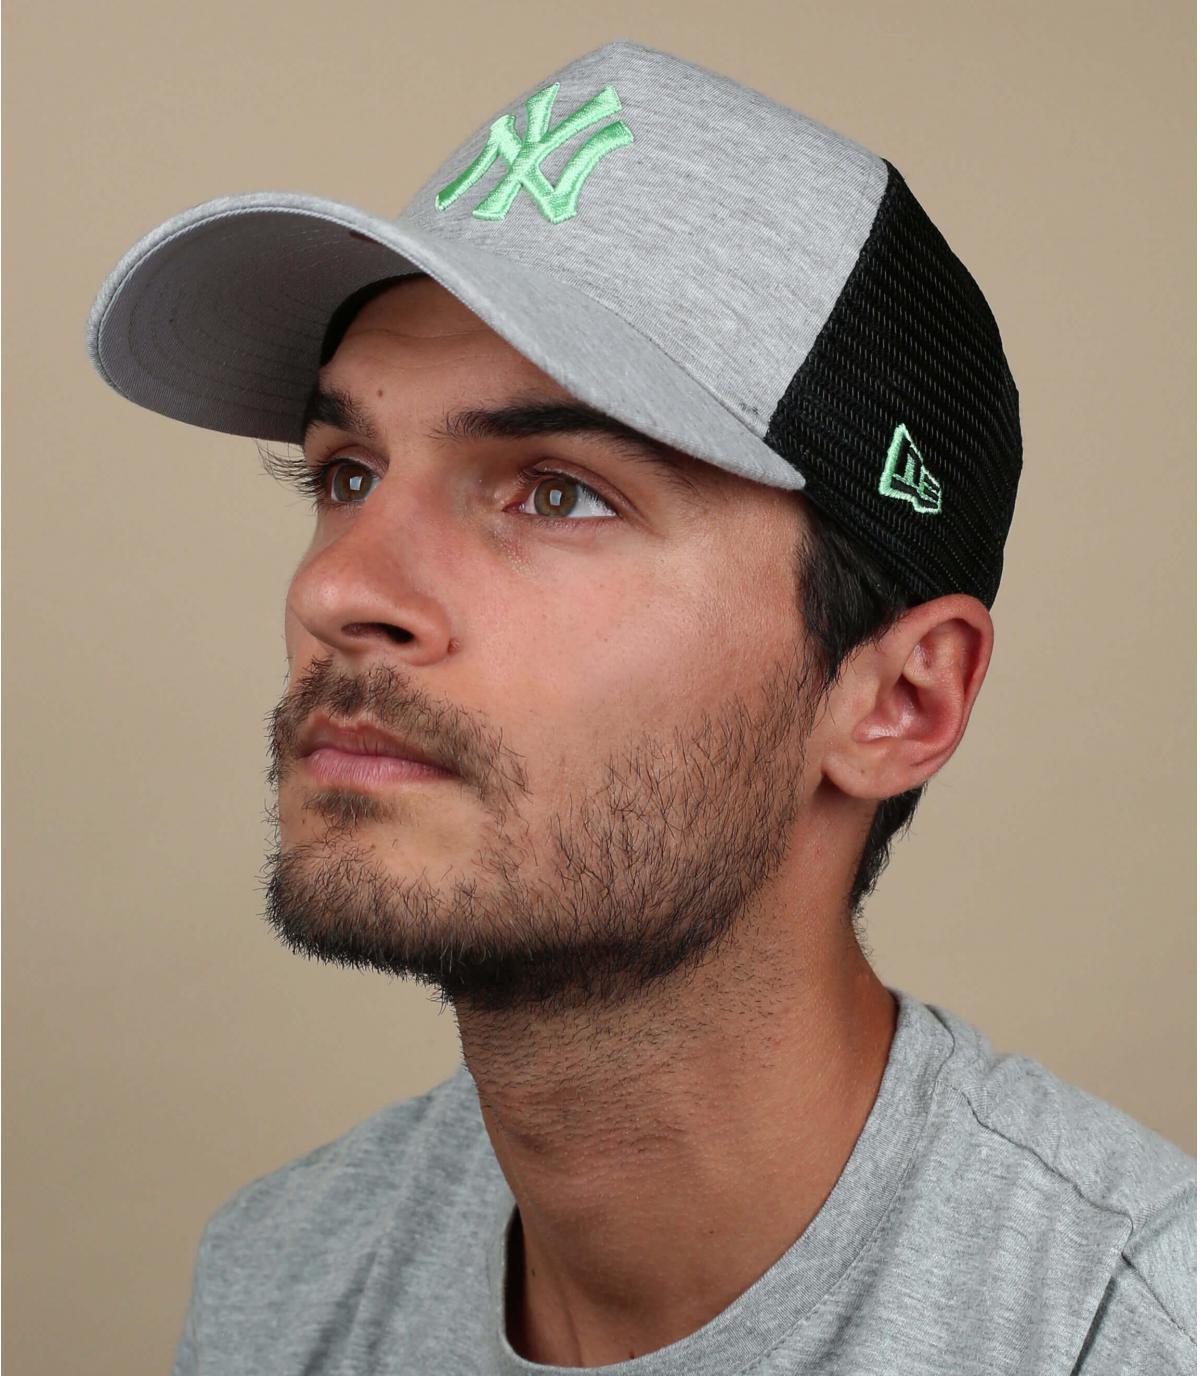 NY trucker grigio verde